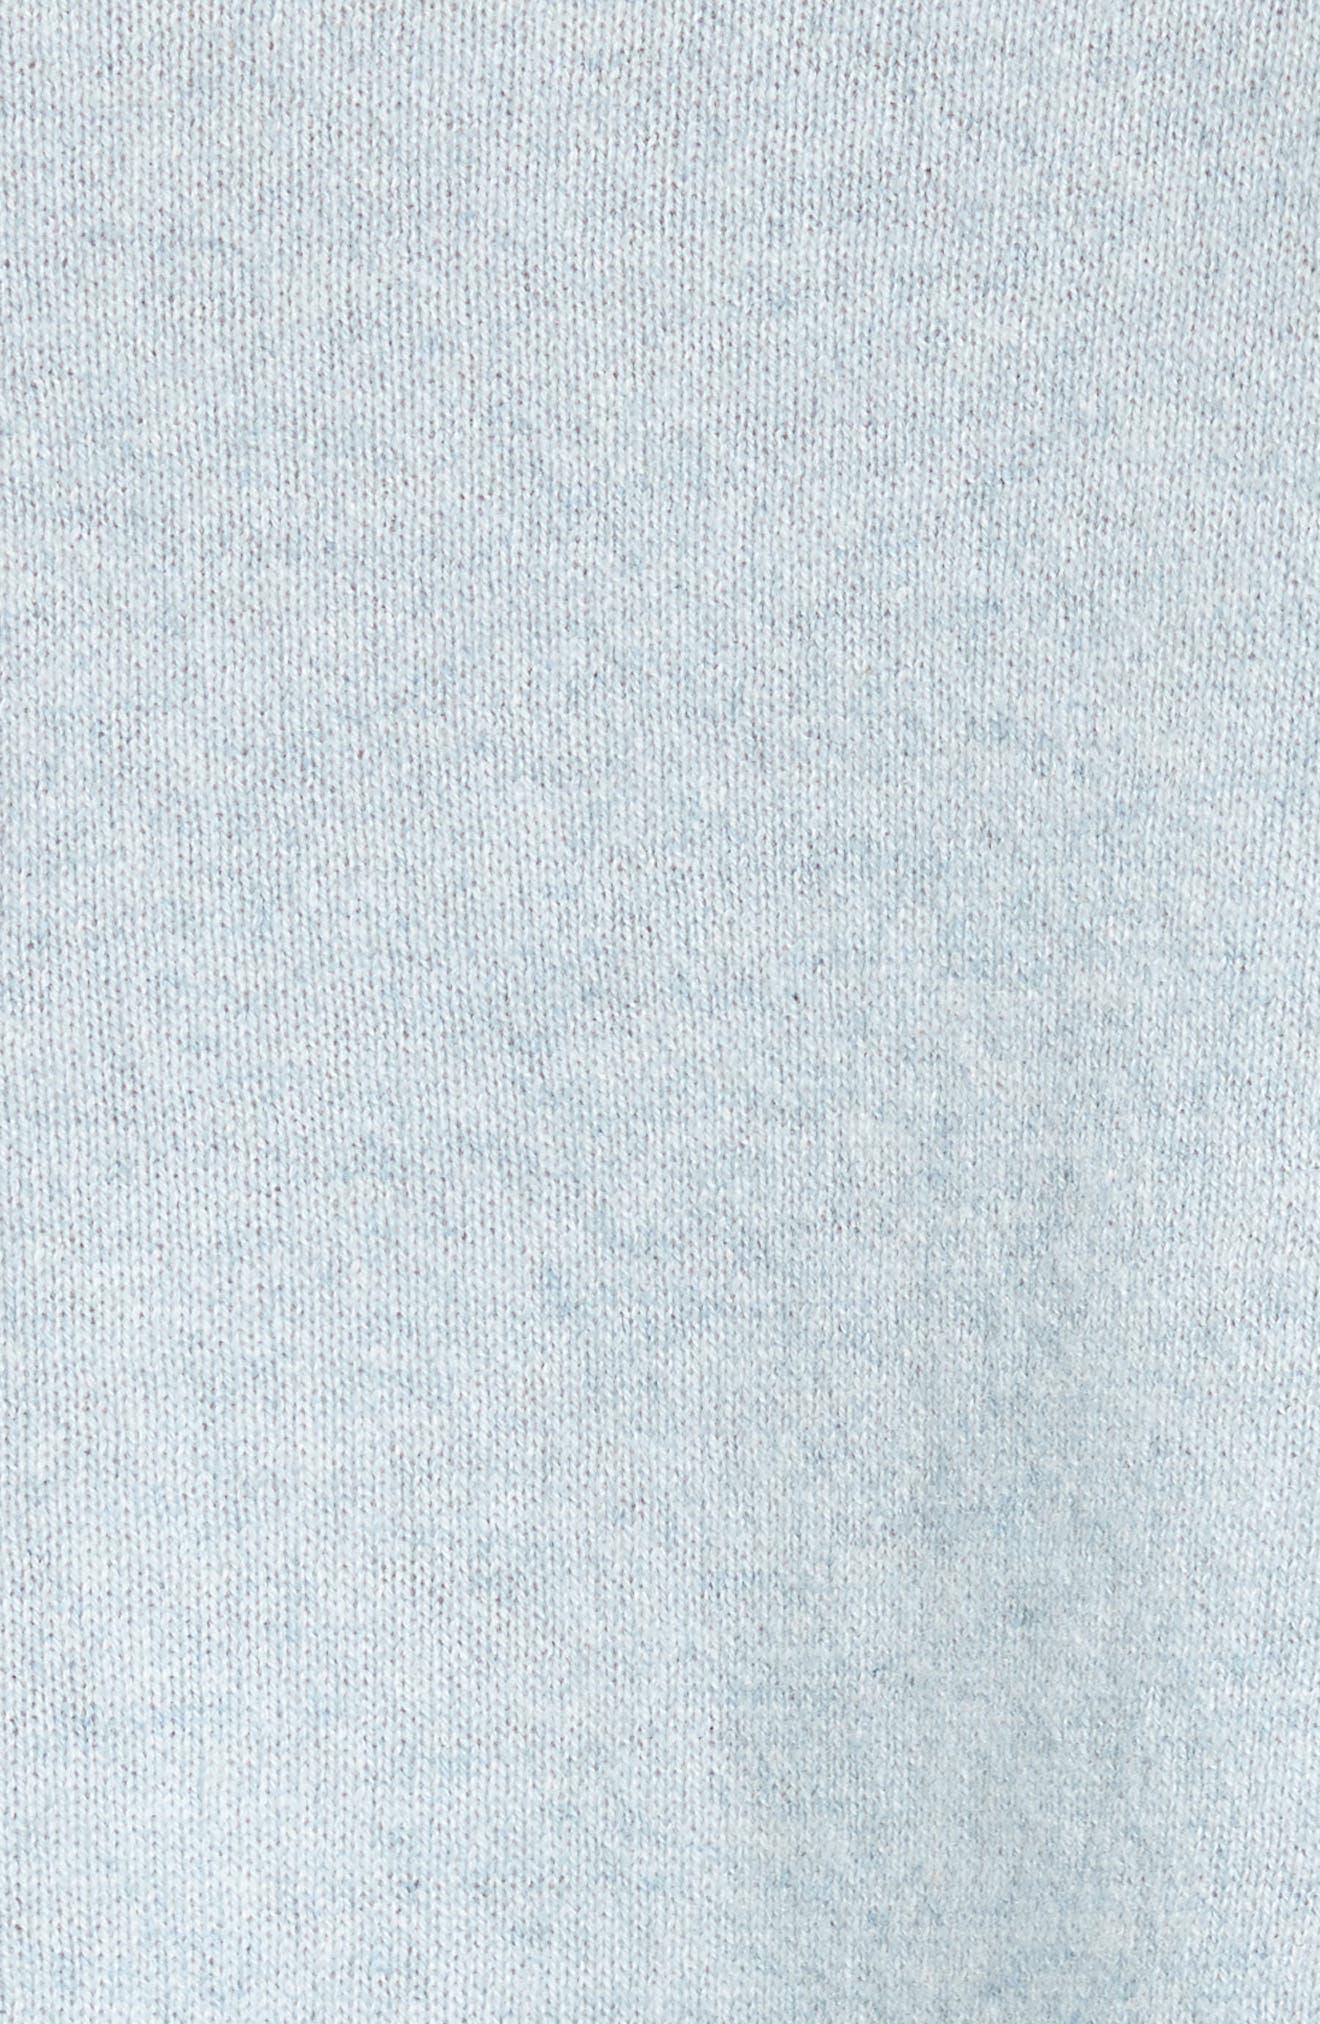 Tambrel H Asymmetrical Hem Cashmere Sweater,                             Alternate thumbnail 5, color,                             400